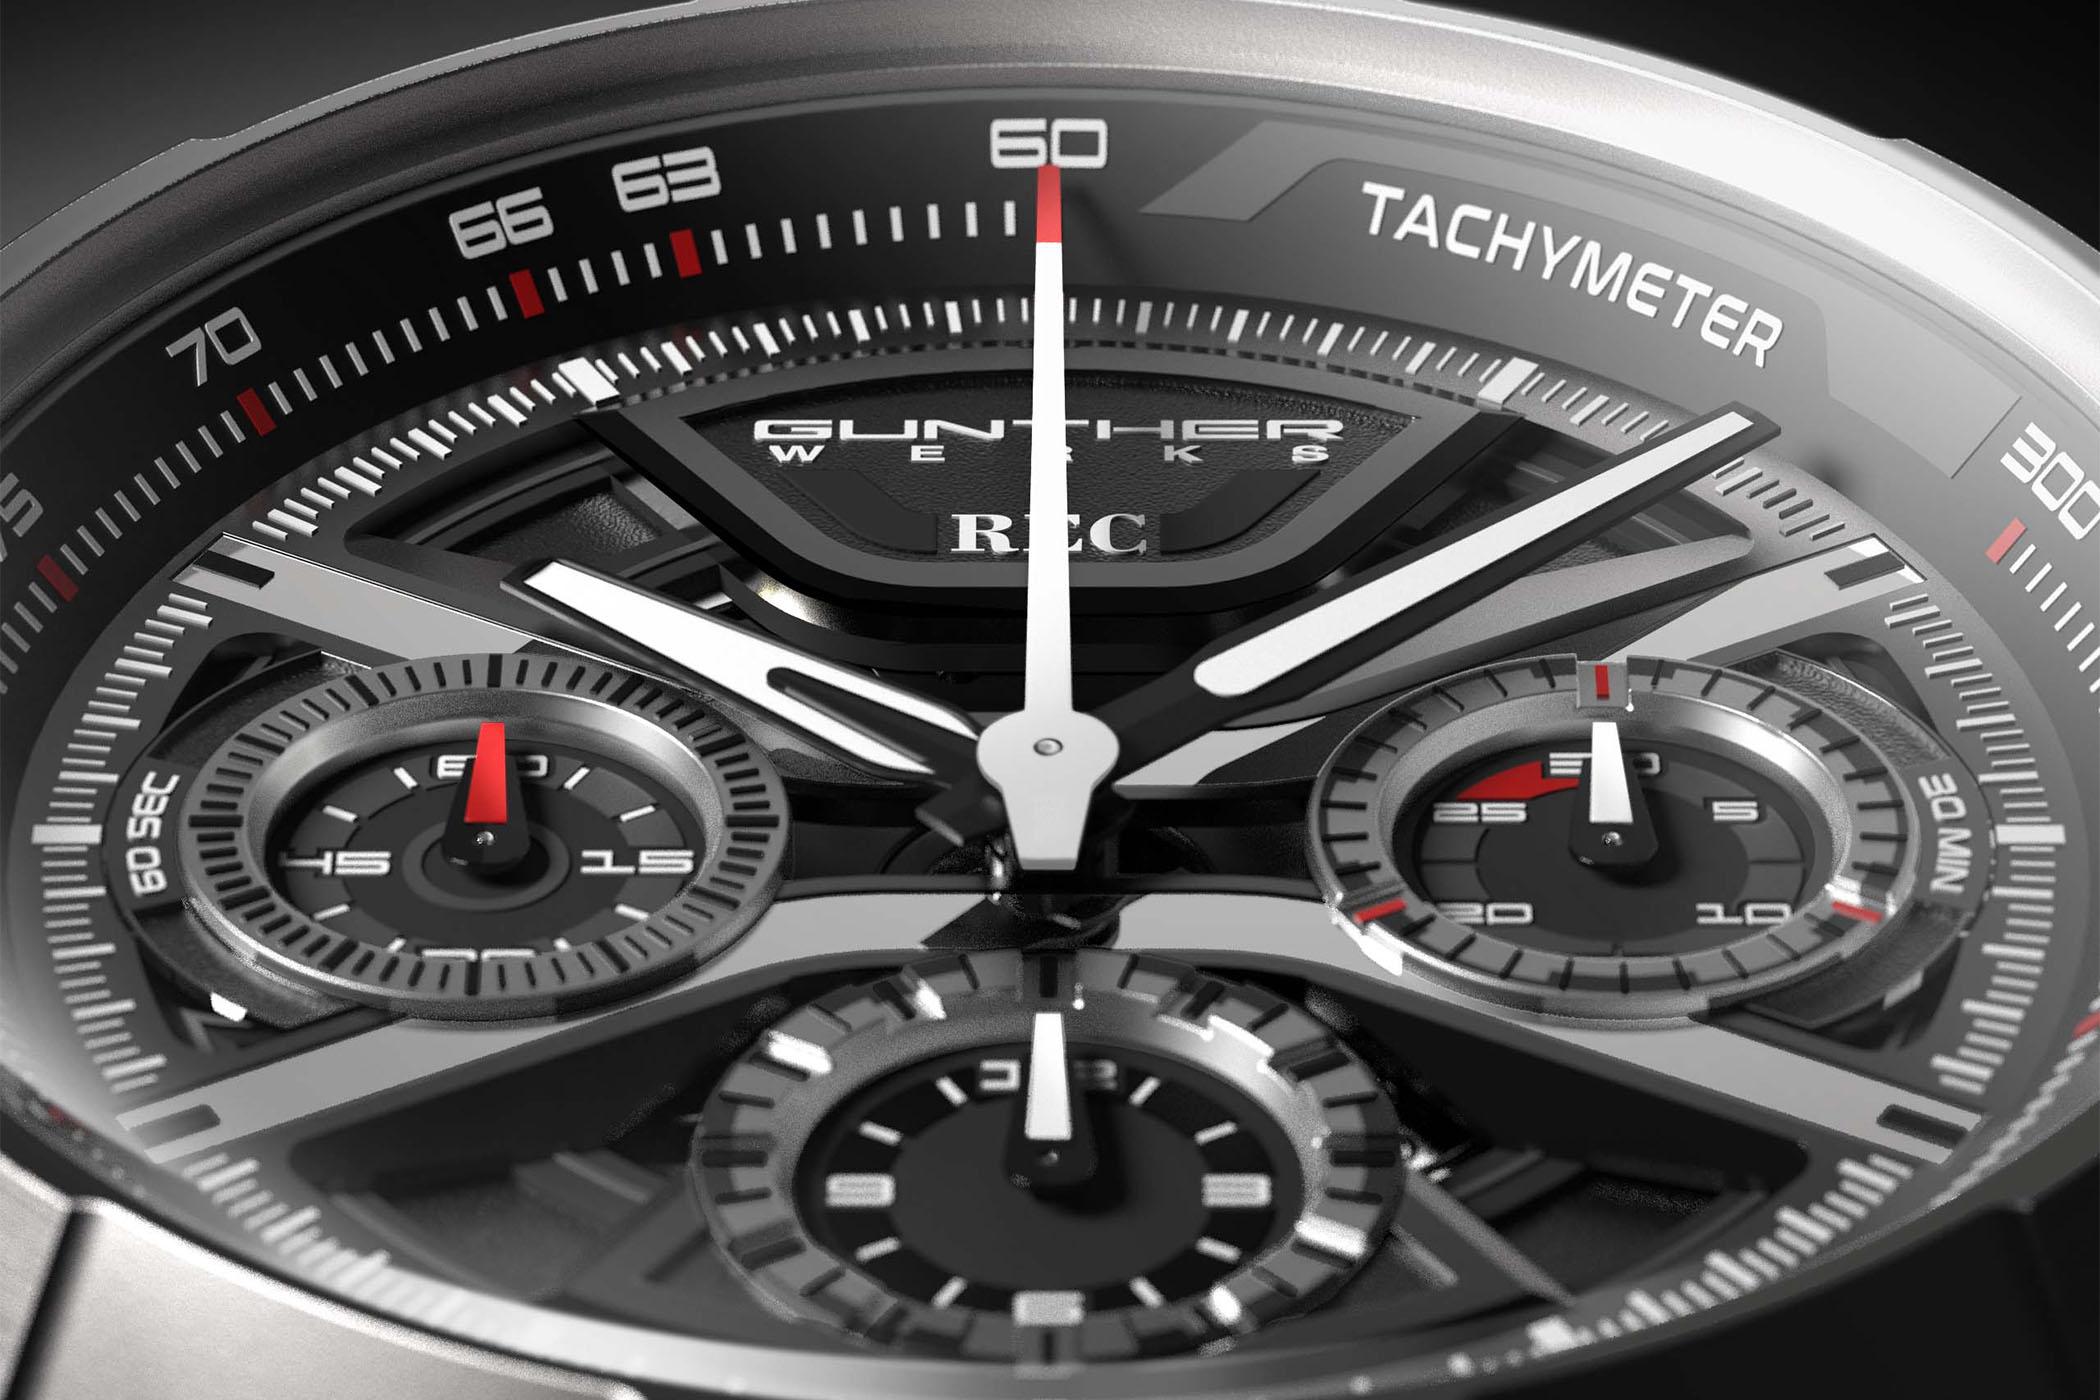 REC Watches 901 GW Chelsea Grey